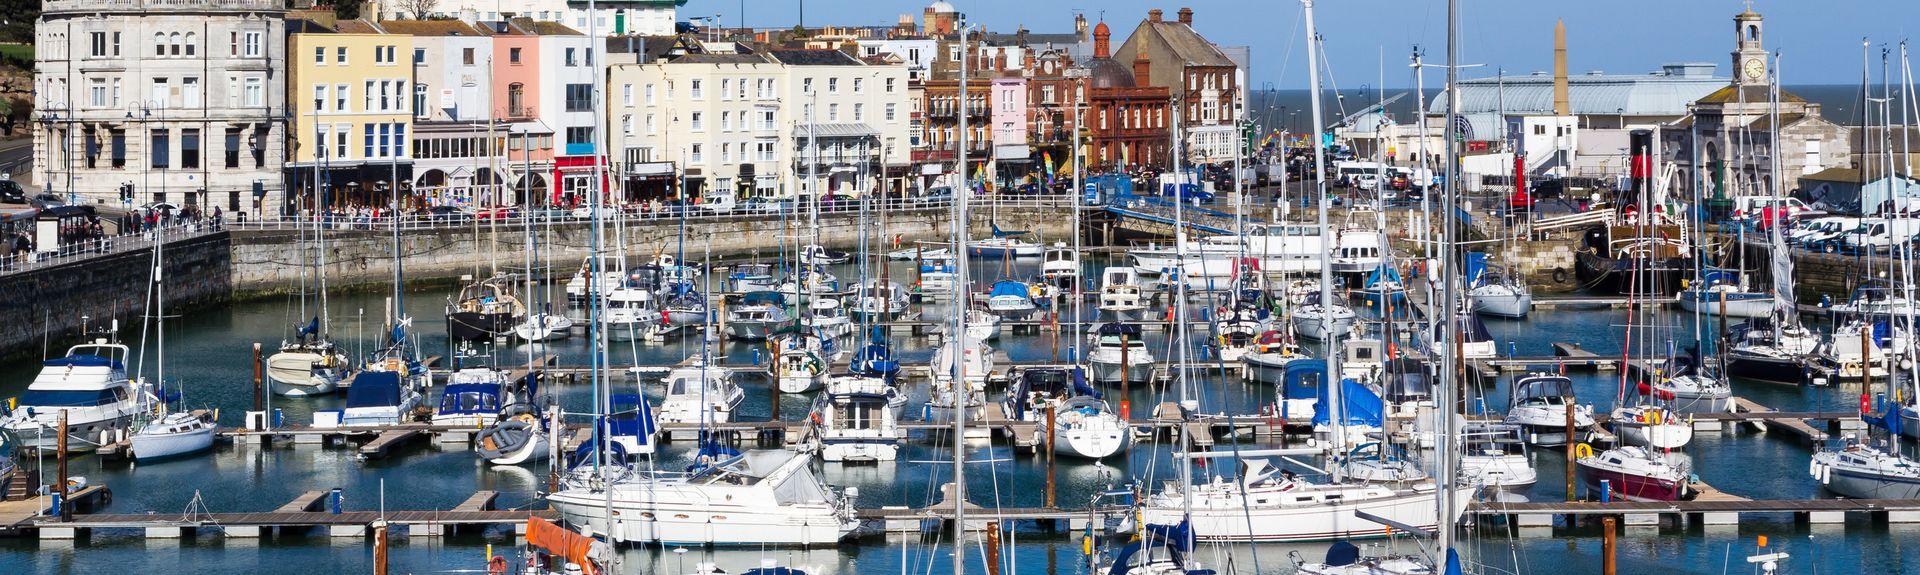 Ramsgate, England, United Kingdom